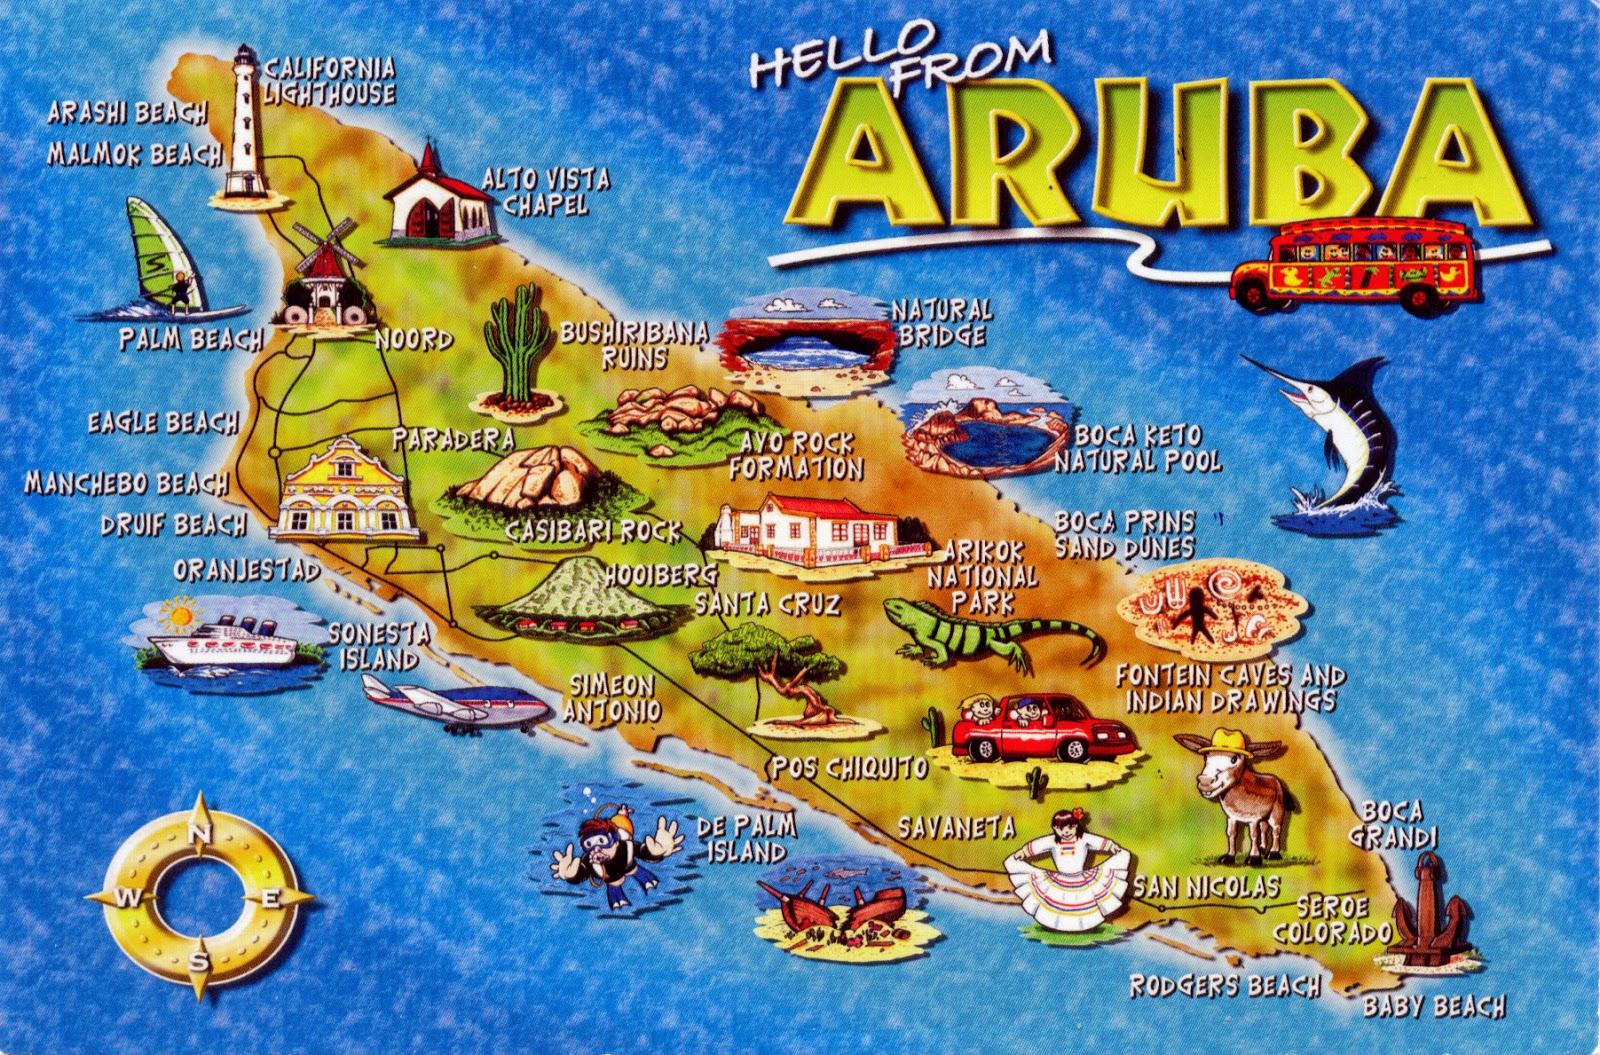 aruba maps caribbean islands, circuit diagram, where is aruba located on world map